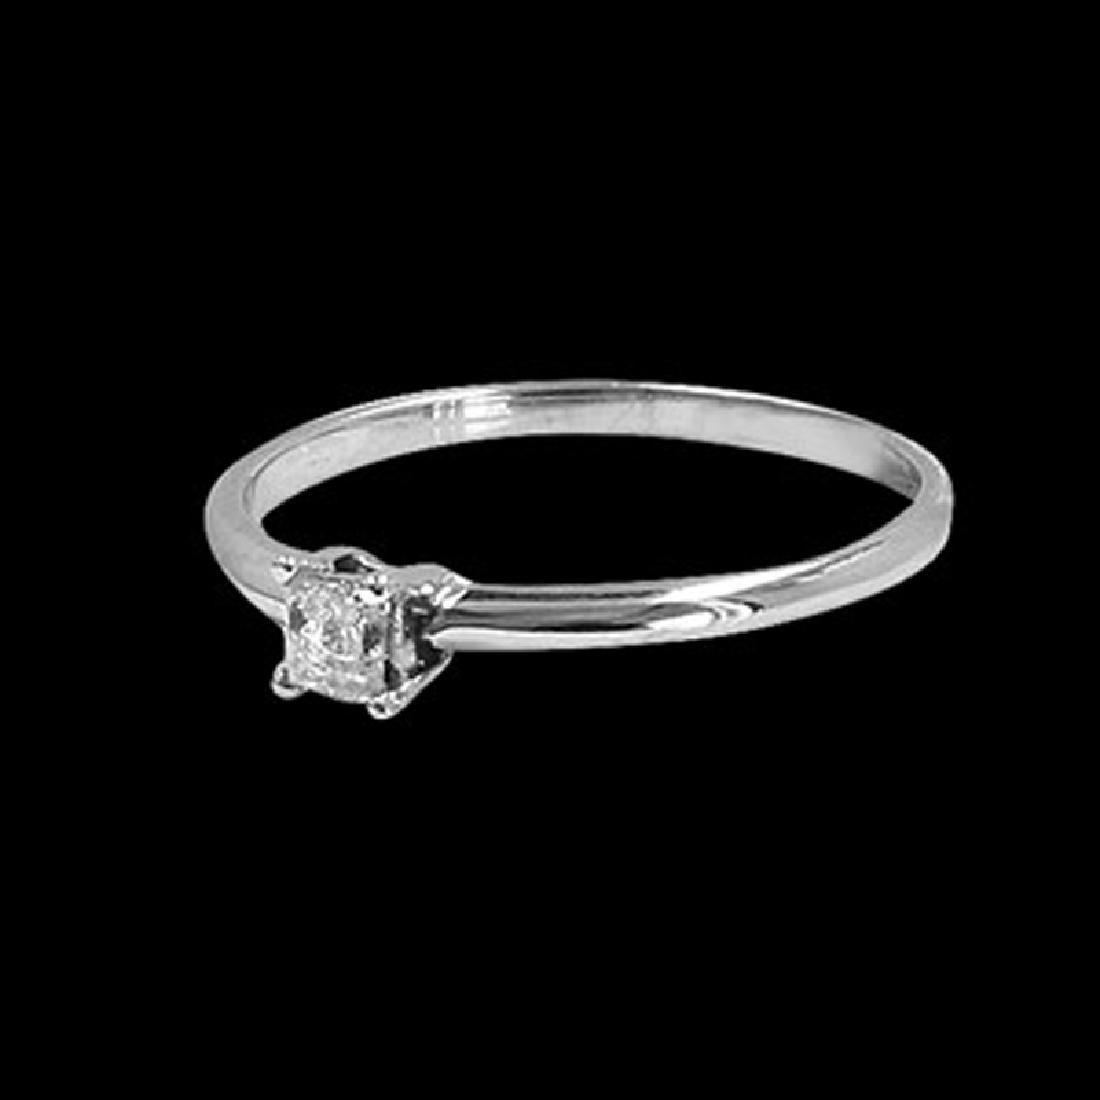 0.16CT NATURAL DIAMOND 14K WHITE GOLD RING